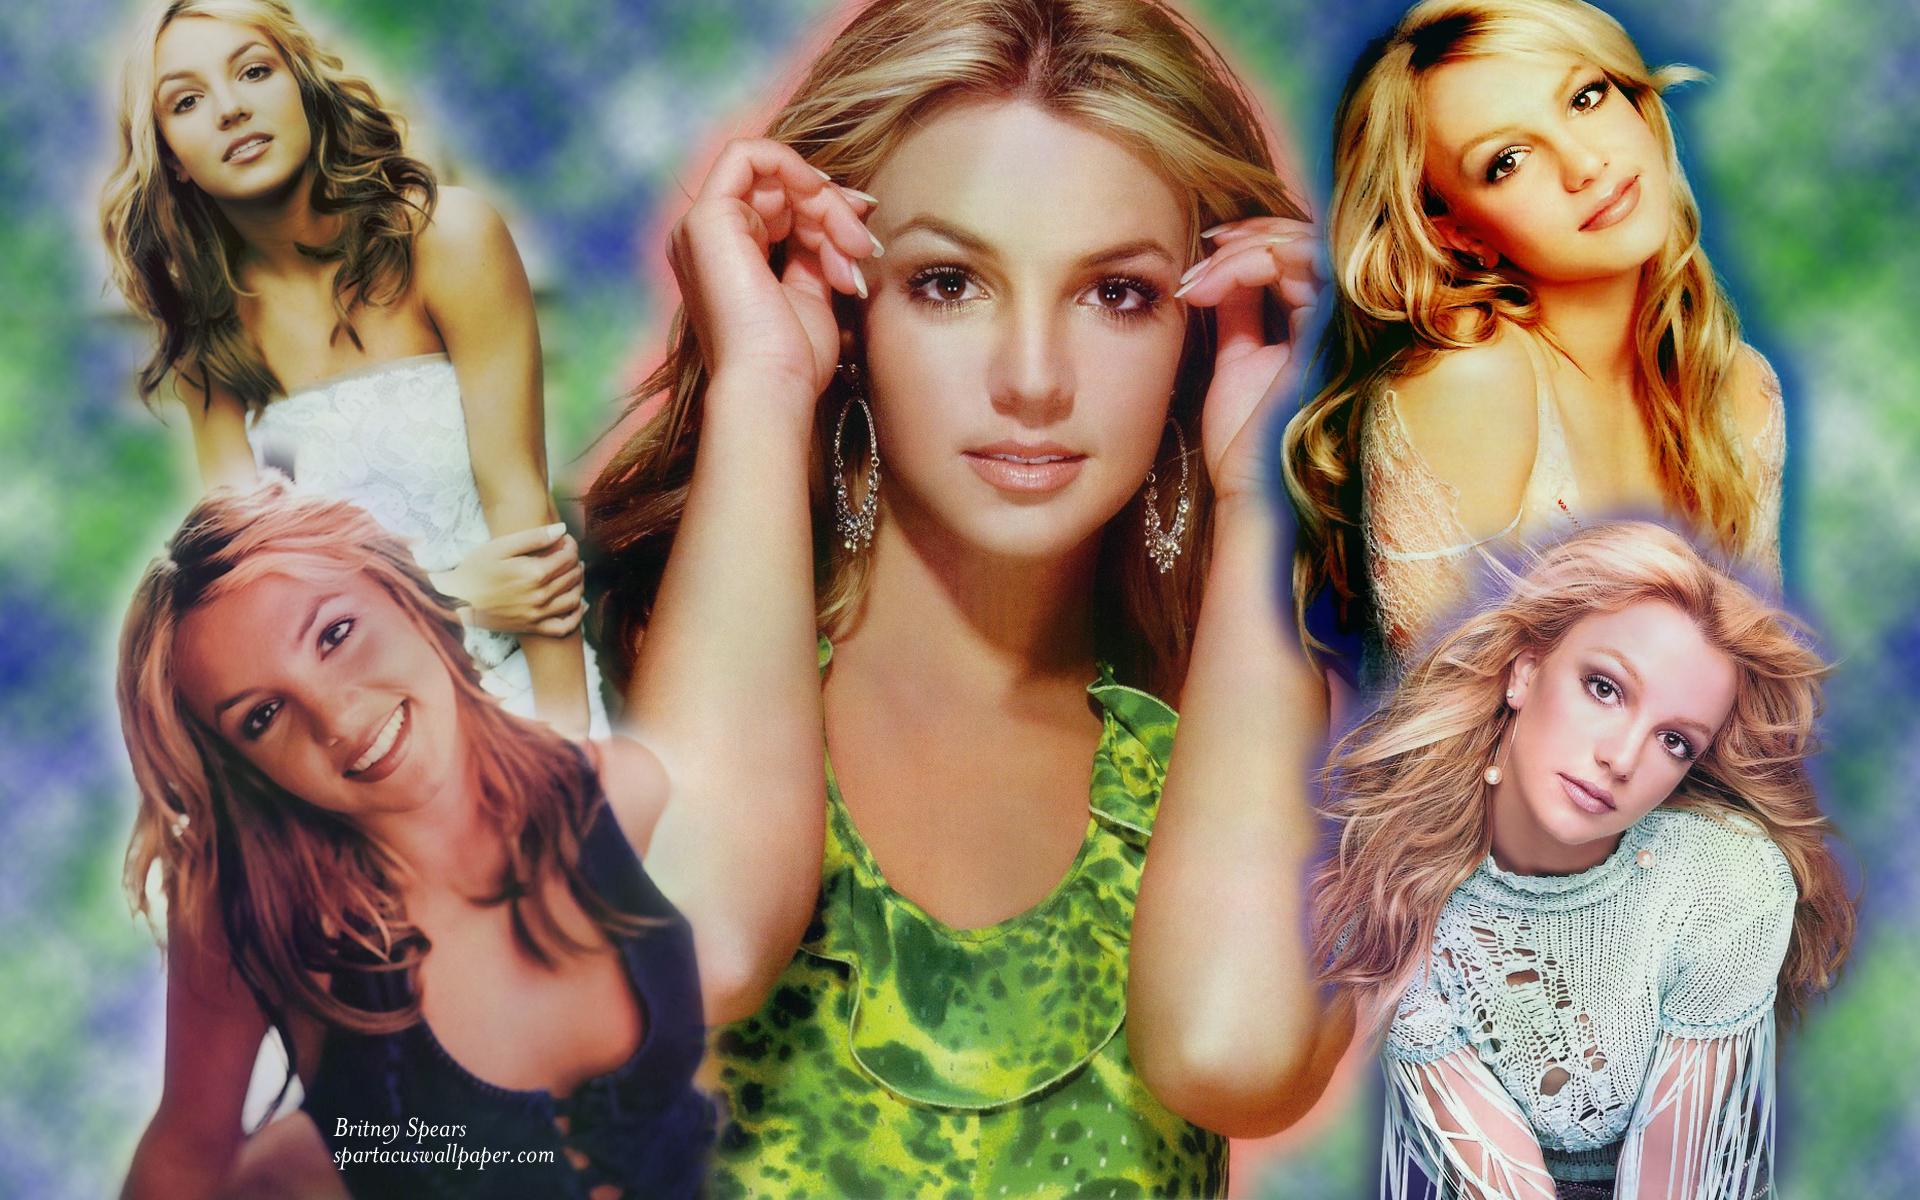 Britney Spears XVII